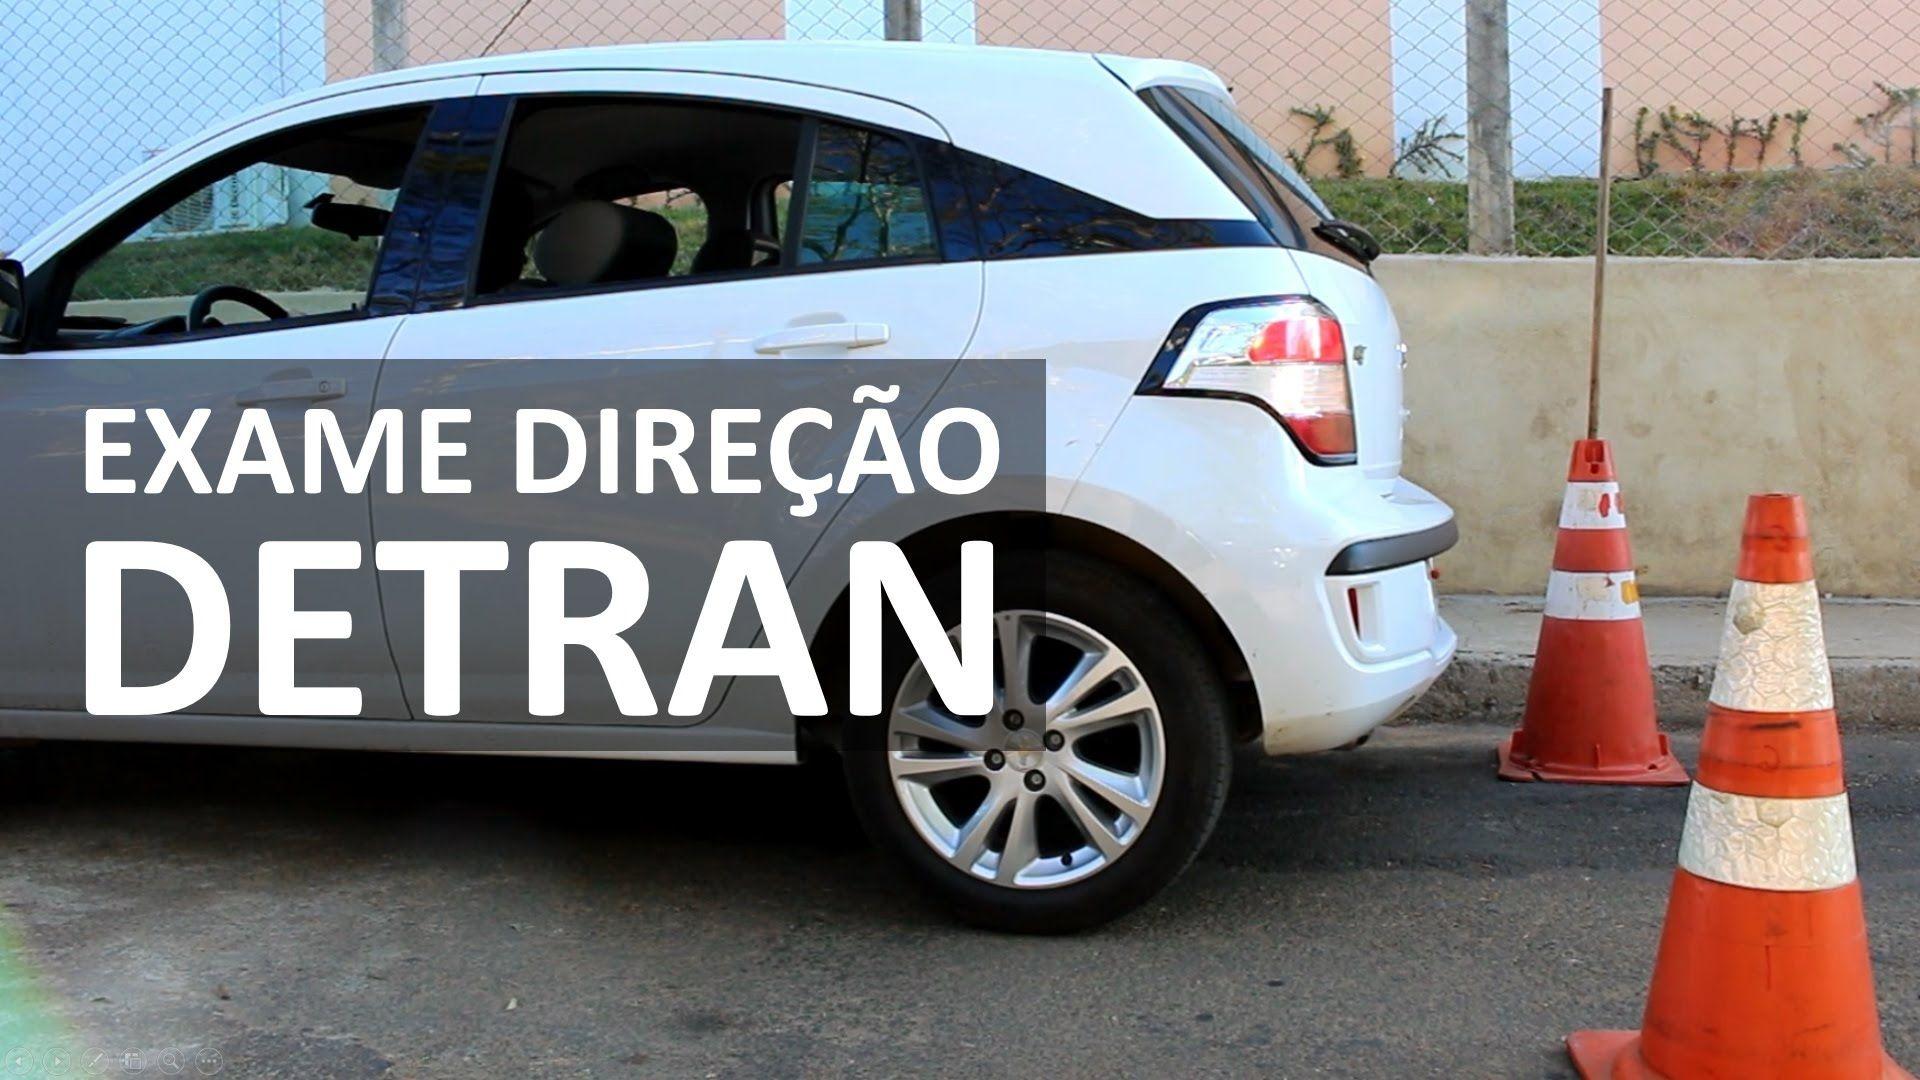 Exame De Direcao Carro Simulacao De Exame Detran Auto Escola